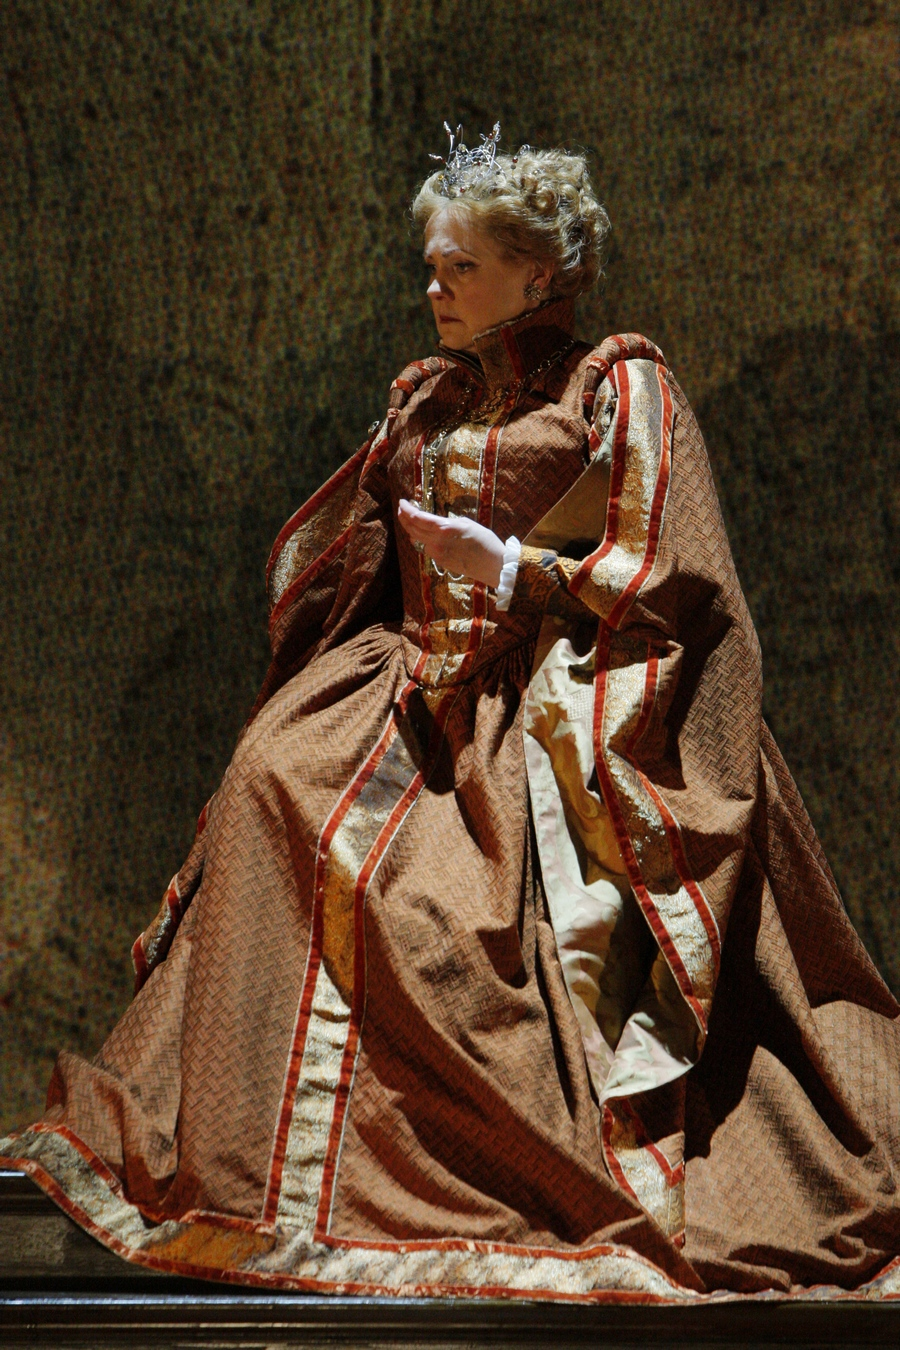 ARTS IN ACTION: Washington Concert Opera star soprano BRENDA HARRIS as Elisabetta in Minnesota Opera's 2010 production of Gaetano Donizetti's ROBERTO DEVEREUX [Photo by Michael Daniel, © by Minnesota Opera]